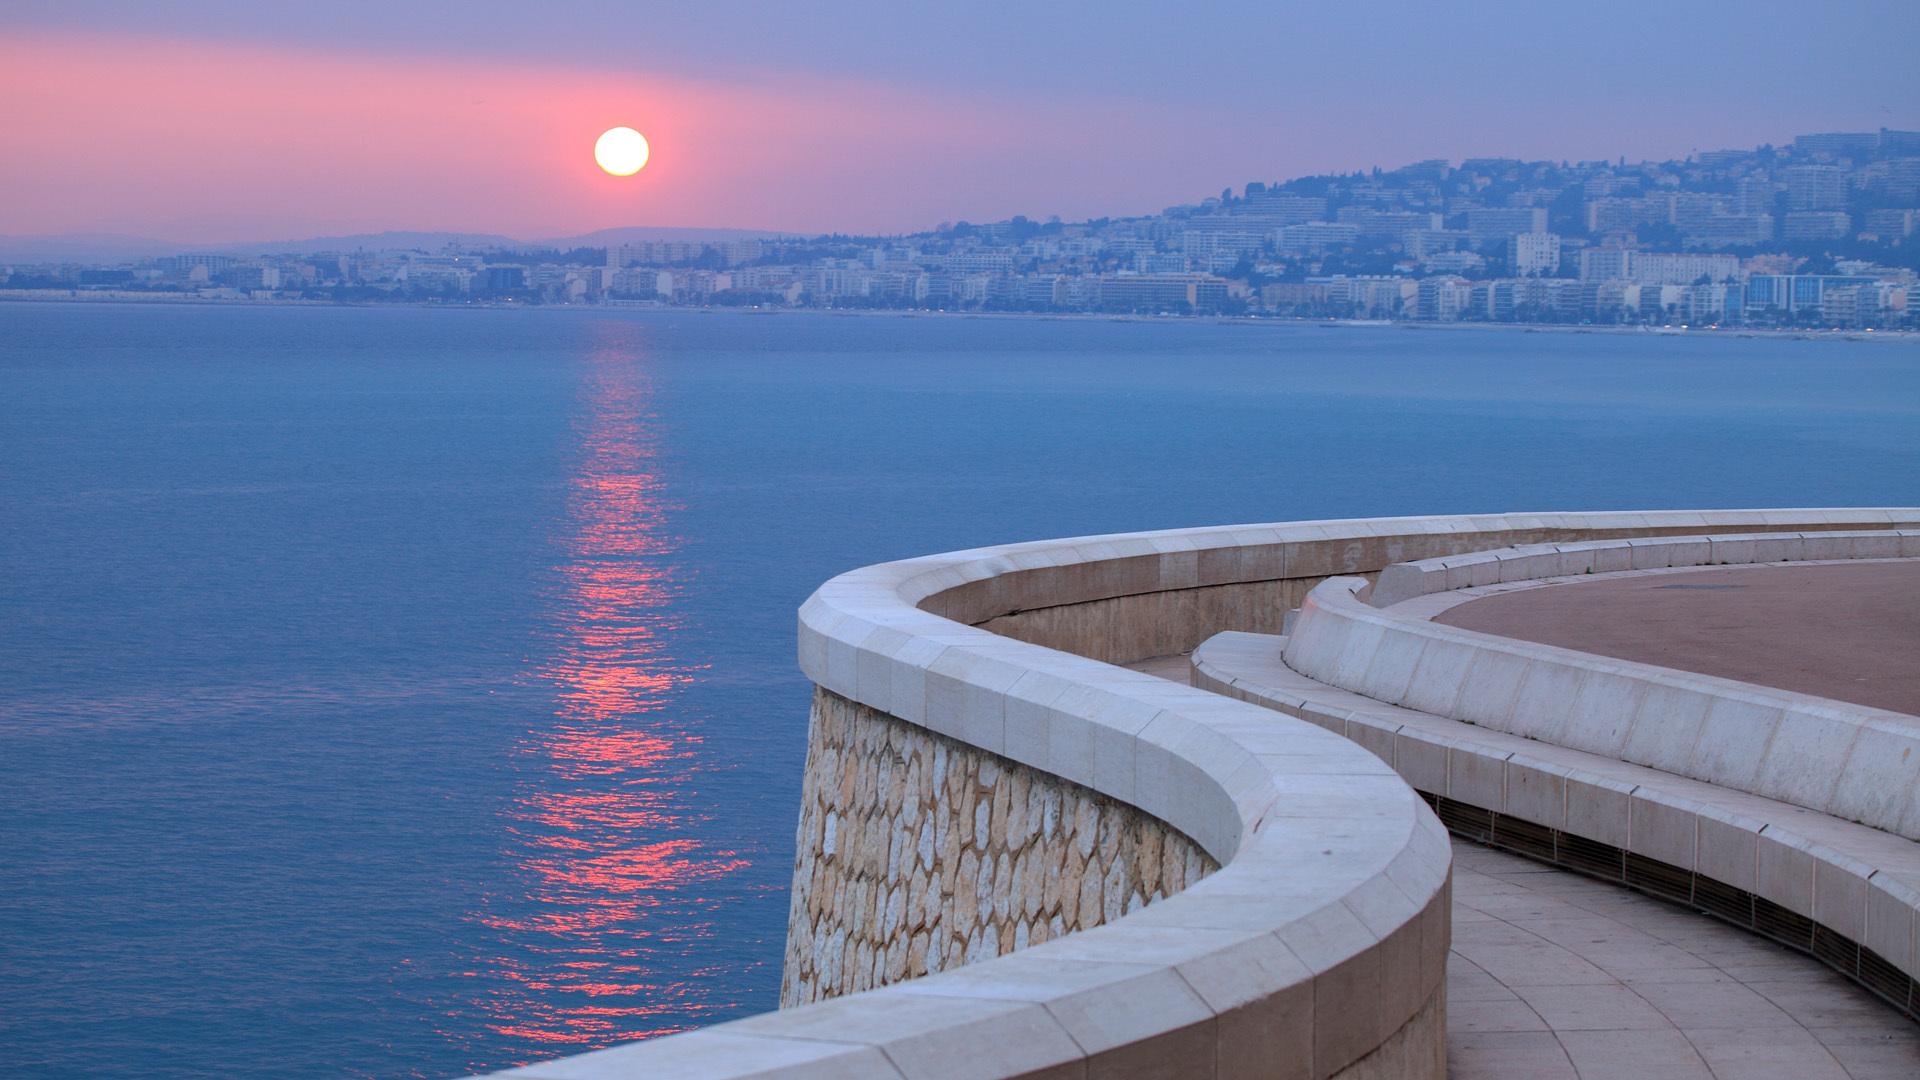 fond ecran gratuit mediterranee